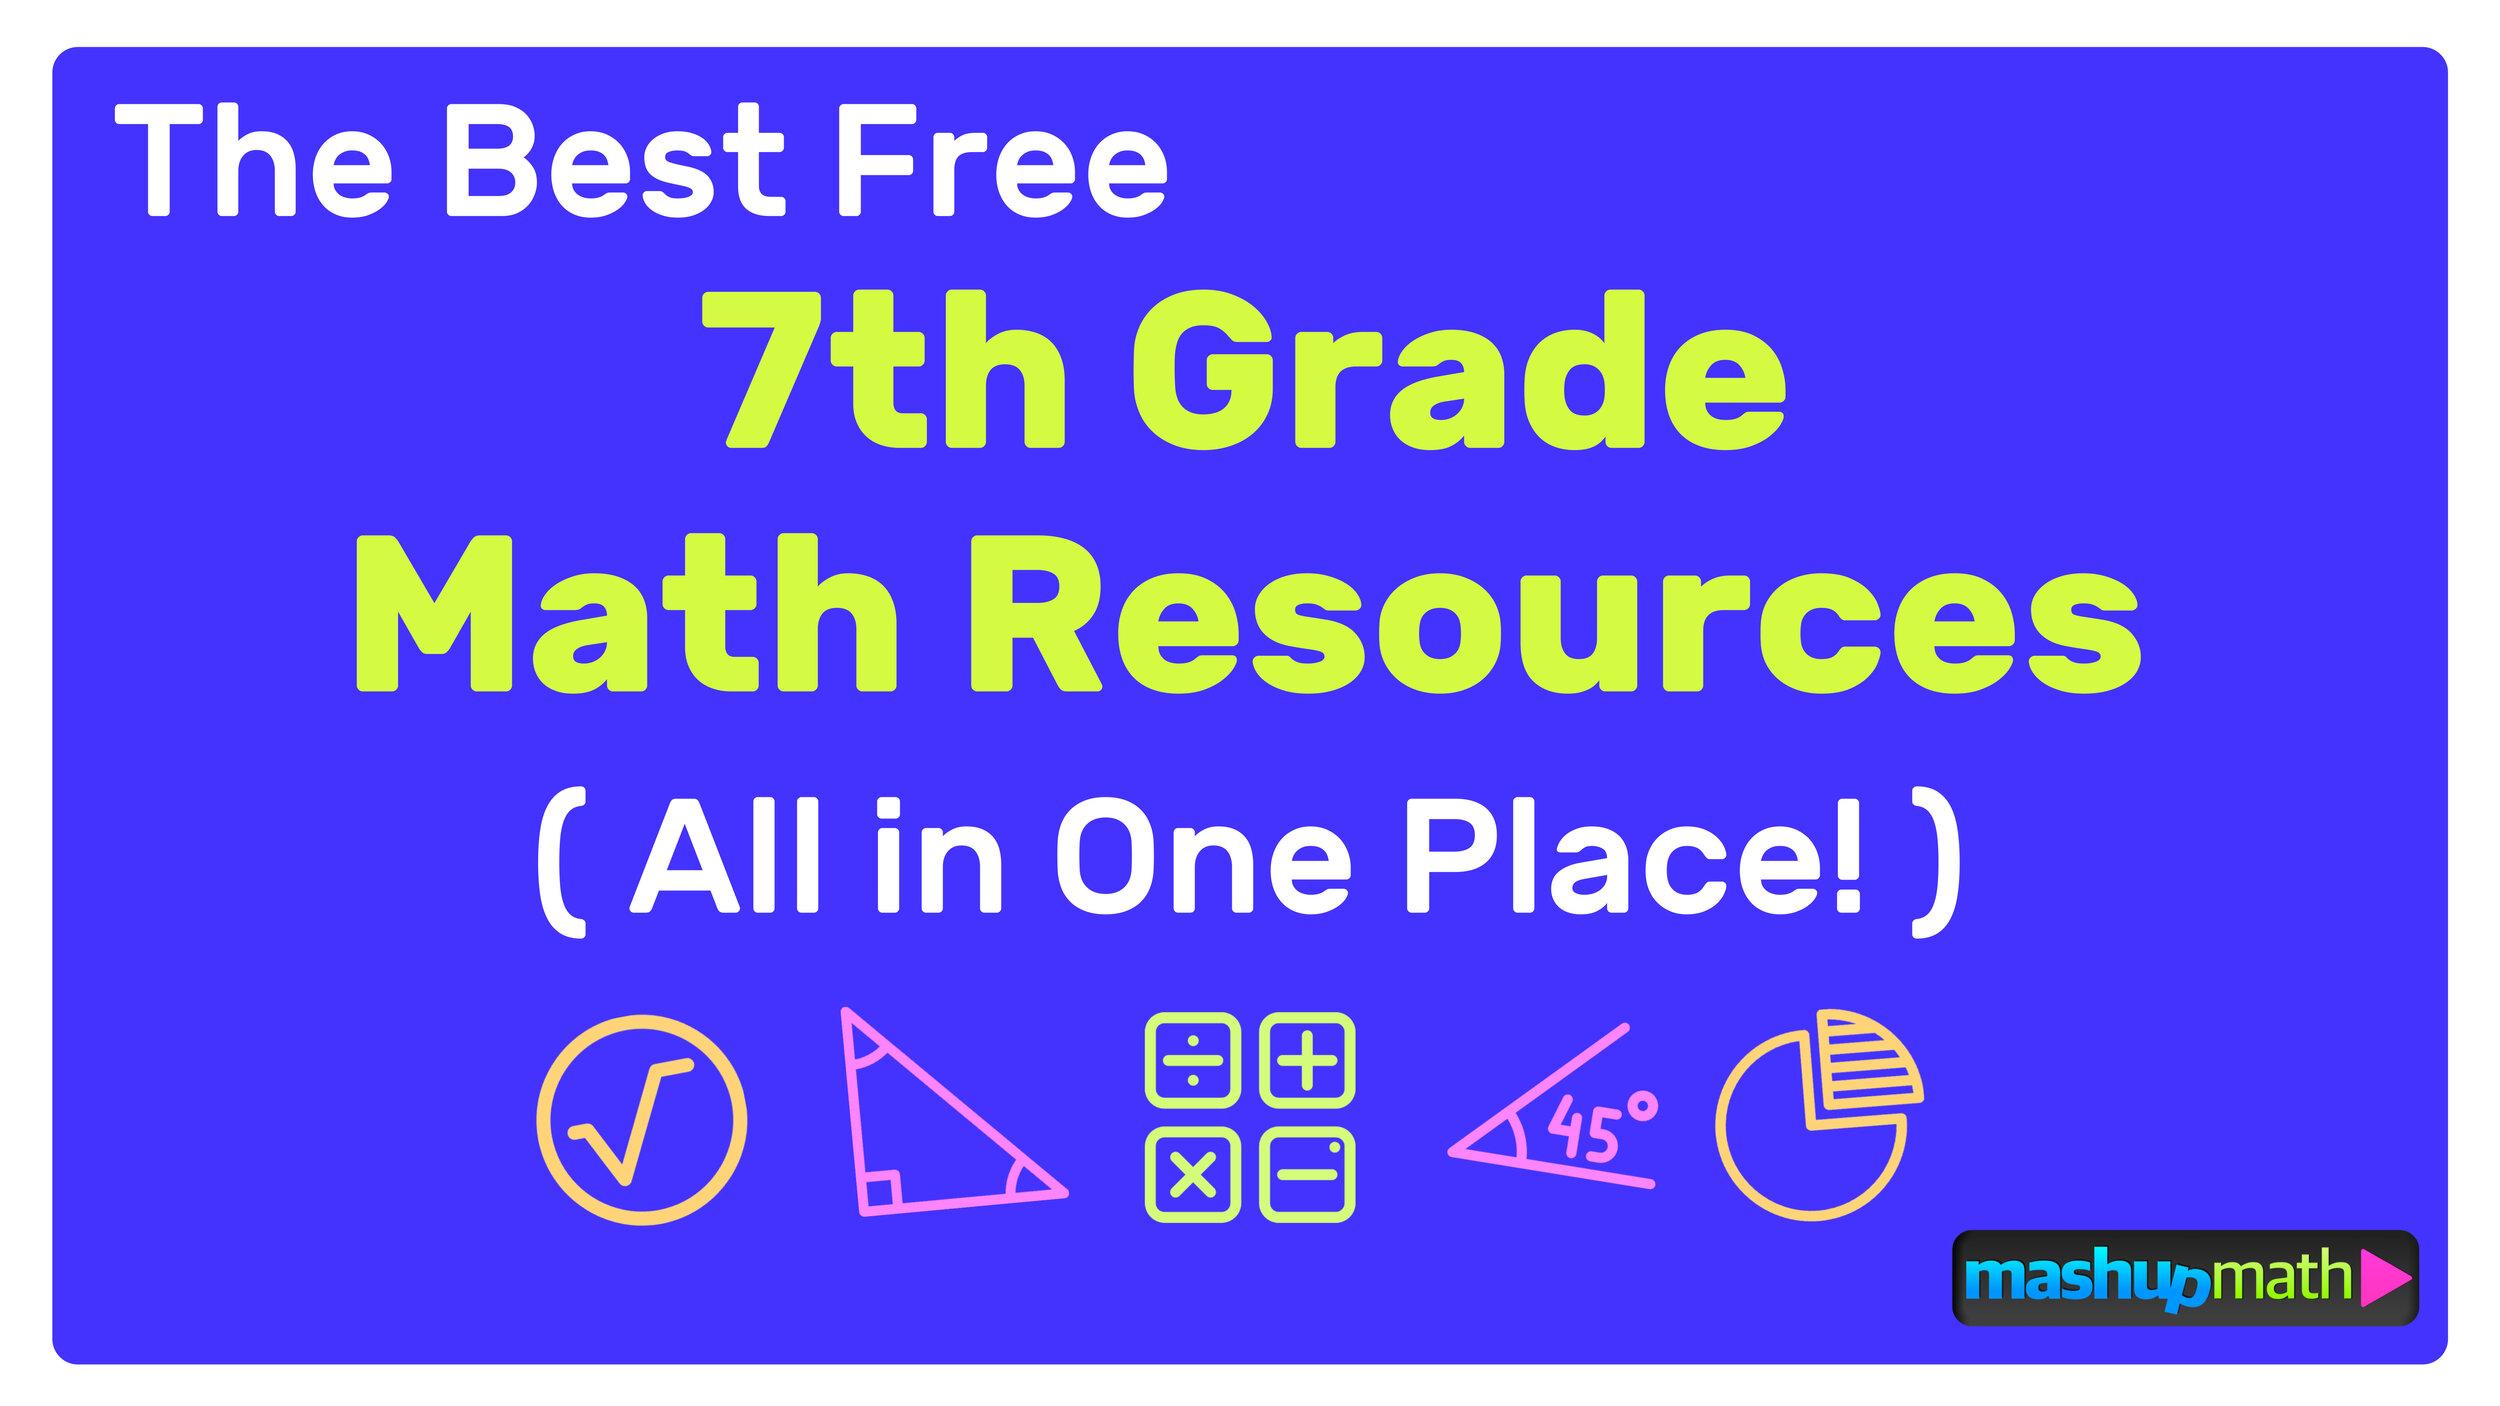 medium resolution of The Best Free 7th Grade Math Resources: Complete List! — Mashup Math